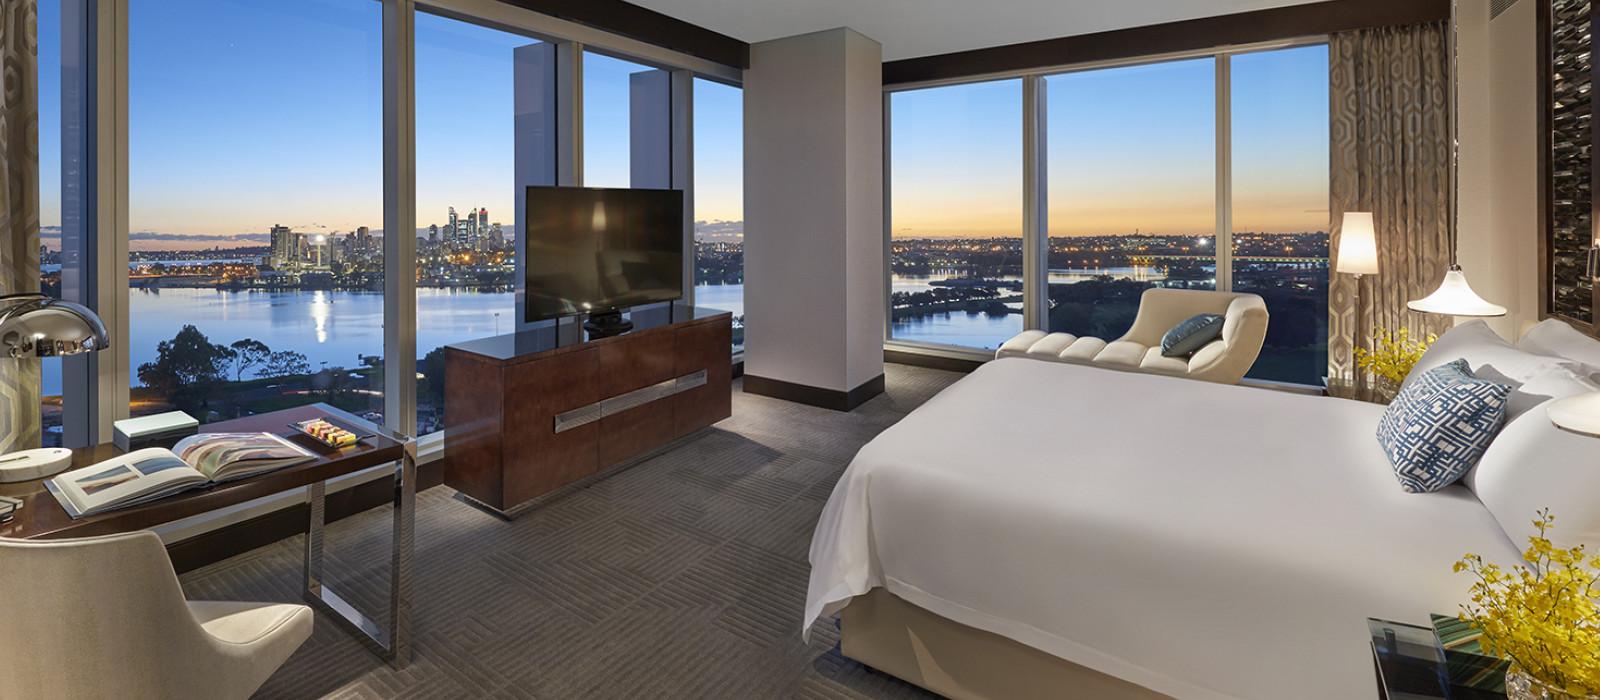 Hotel Crown Towers Perth Australia